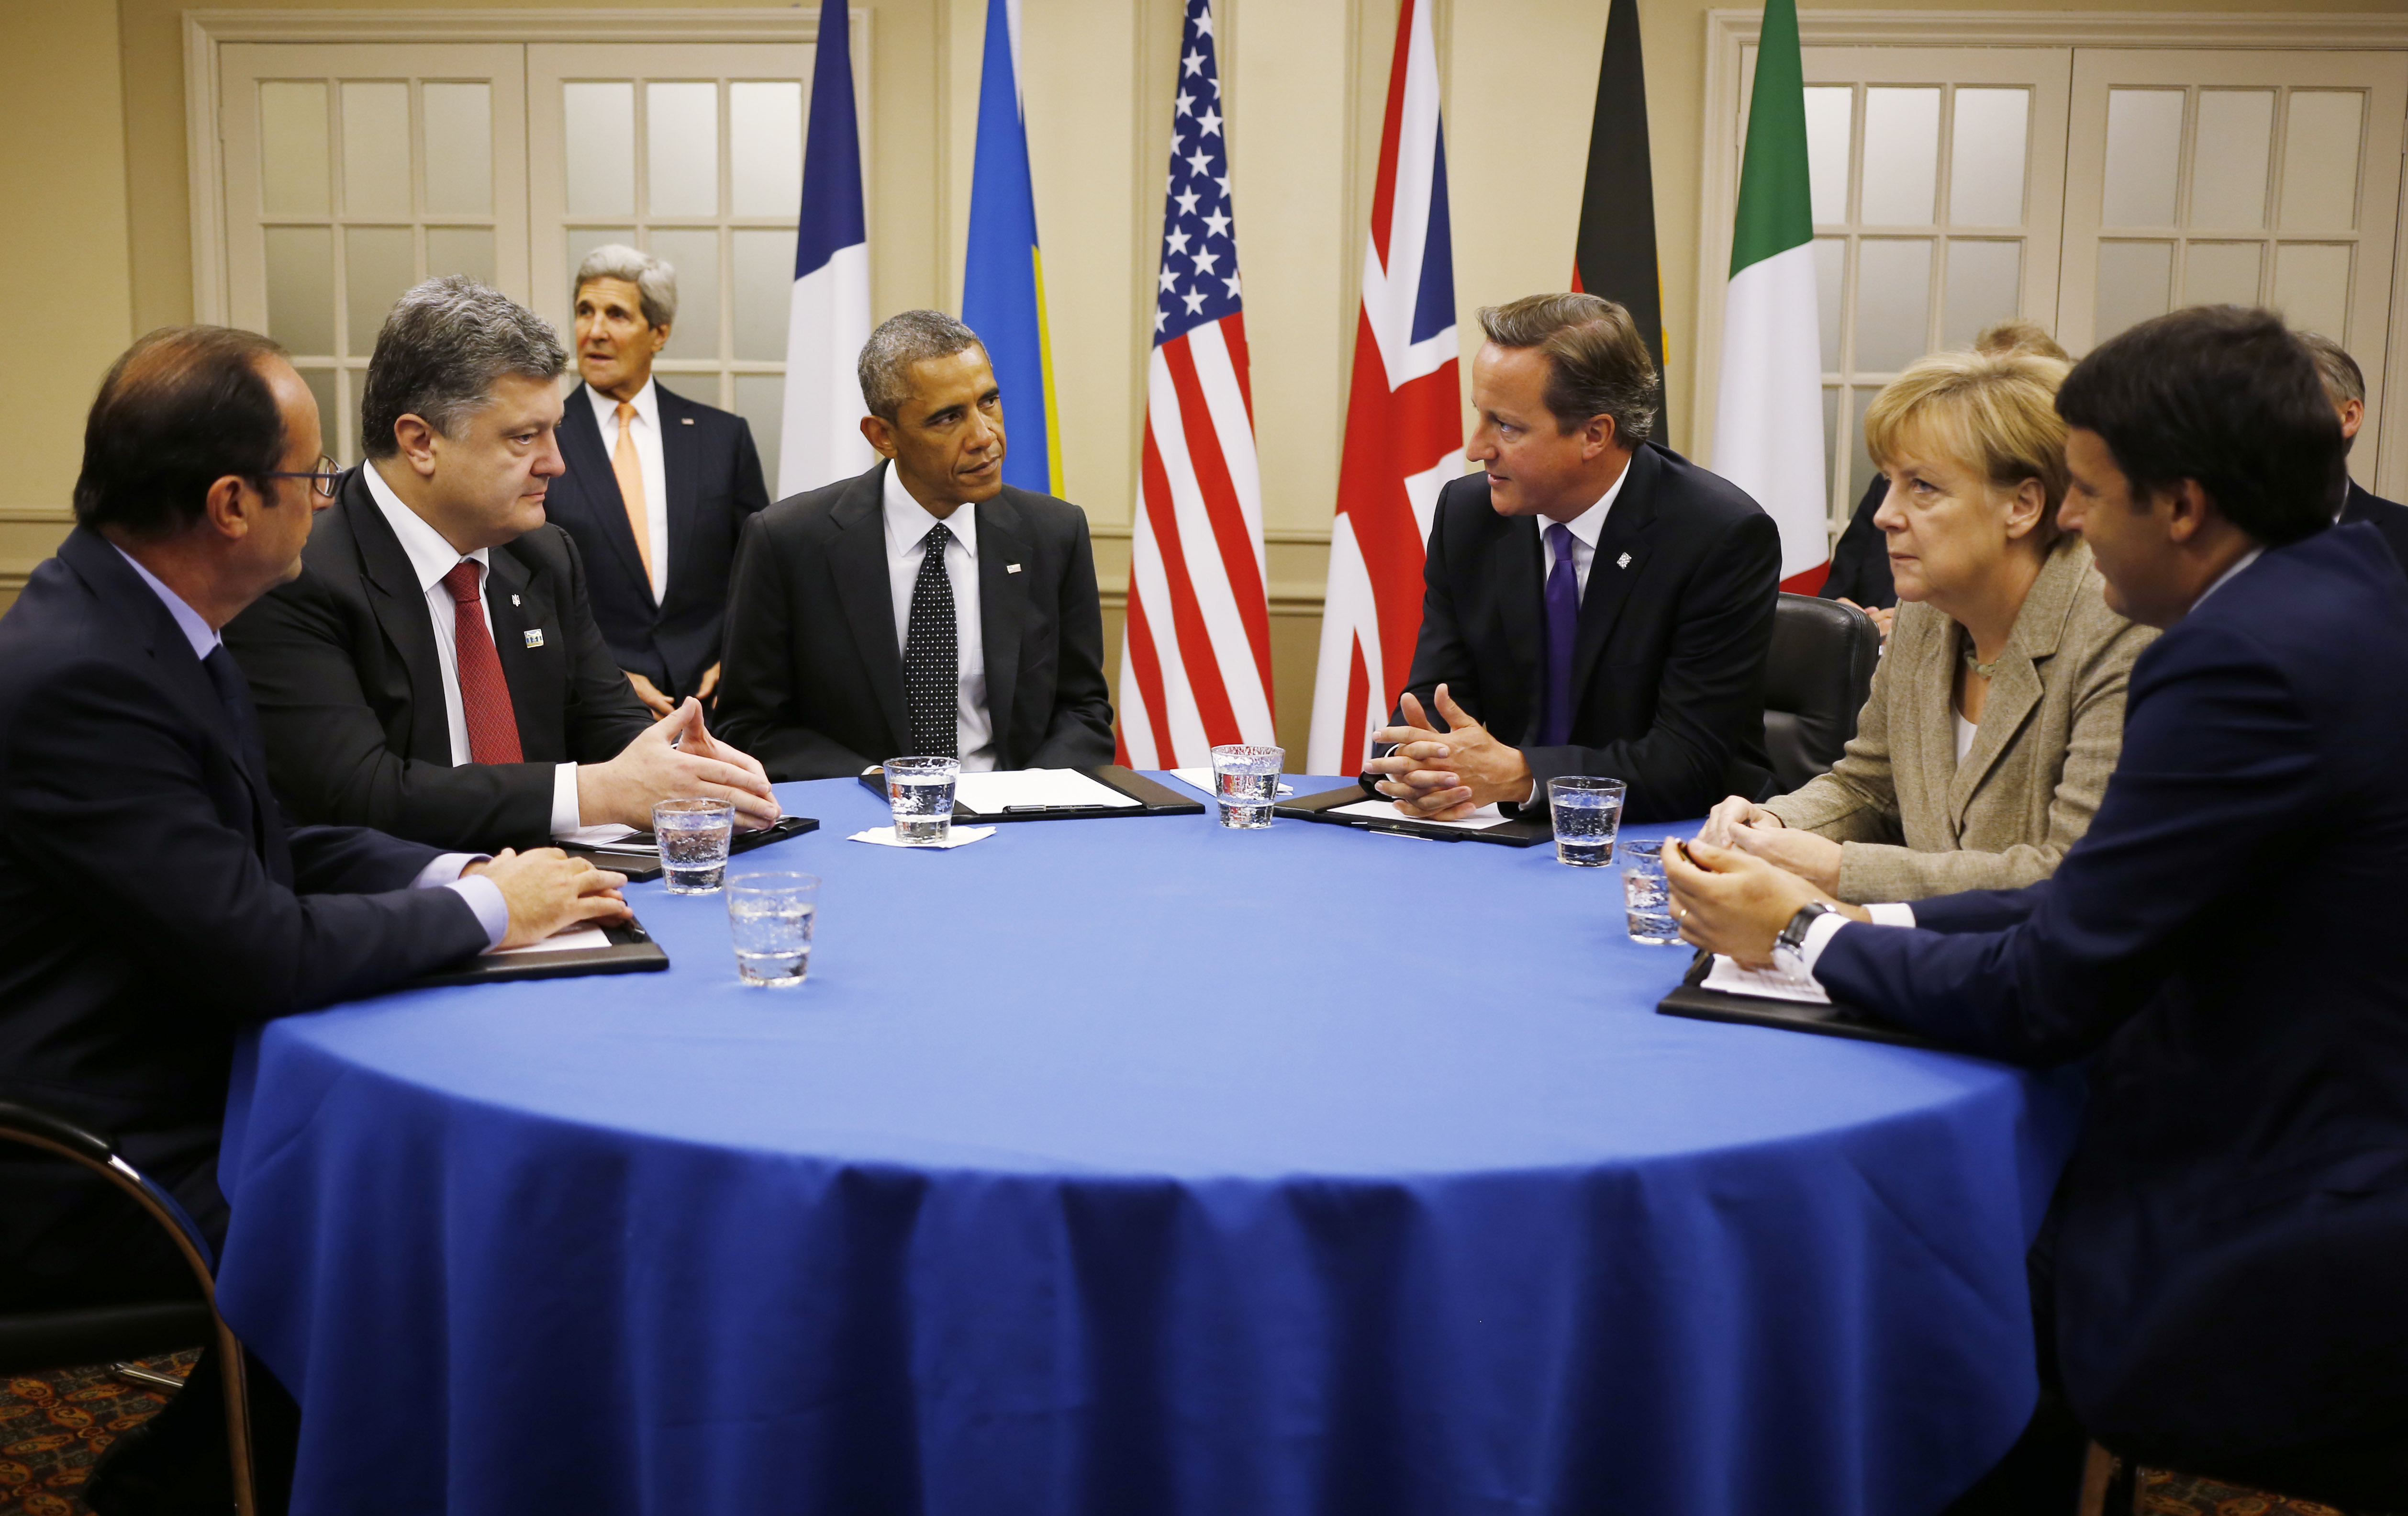 Batı: Rusya'ya basınca devam